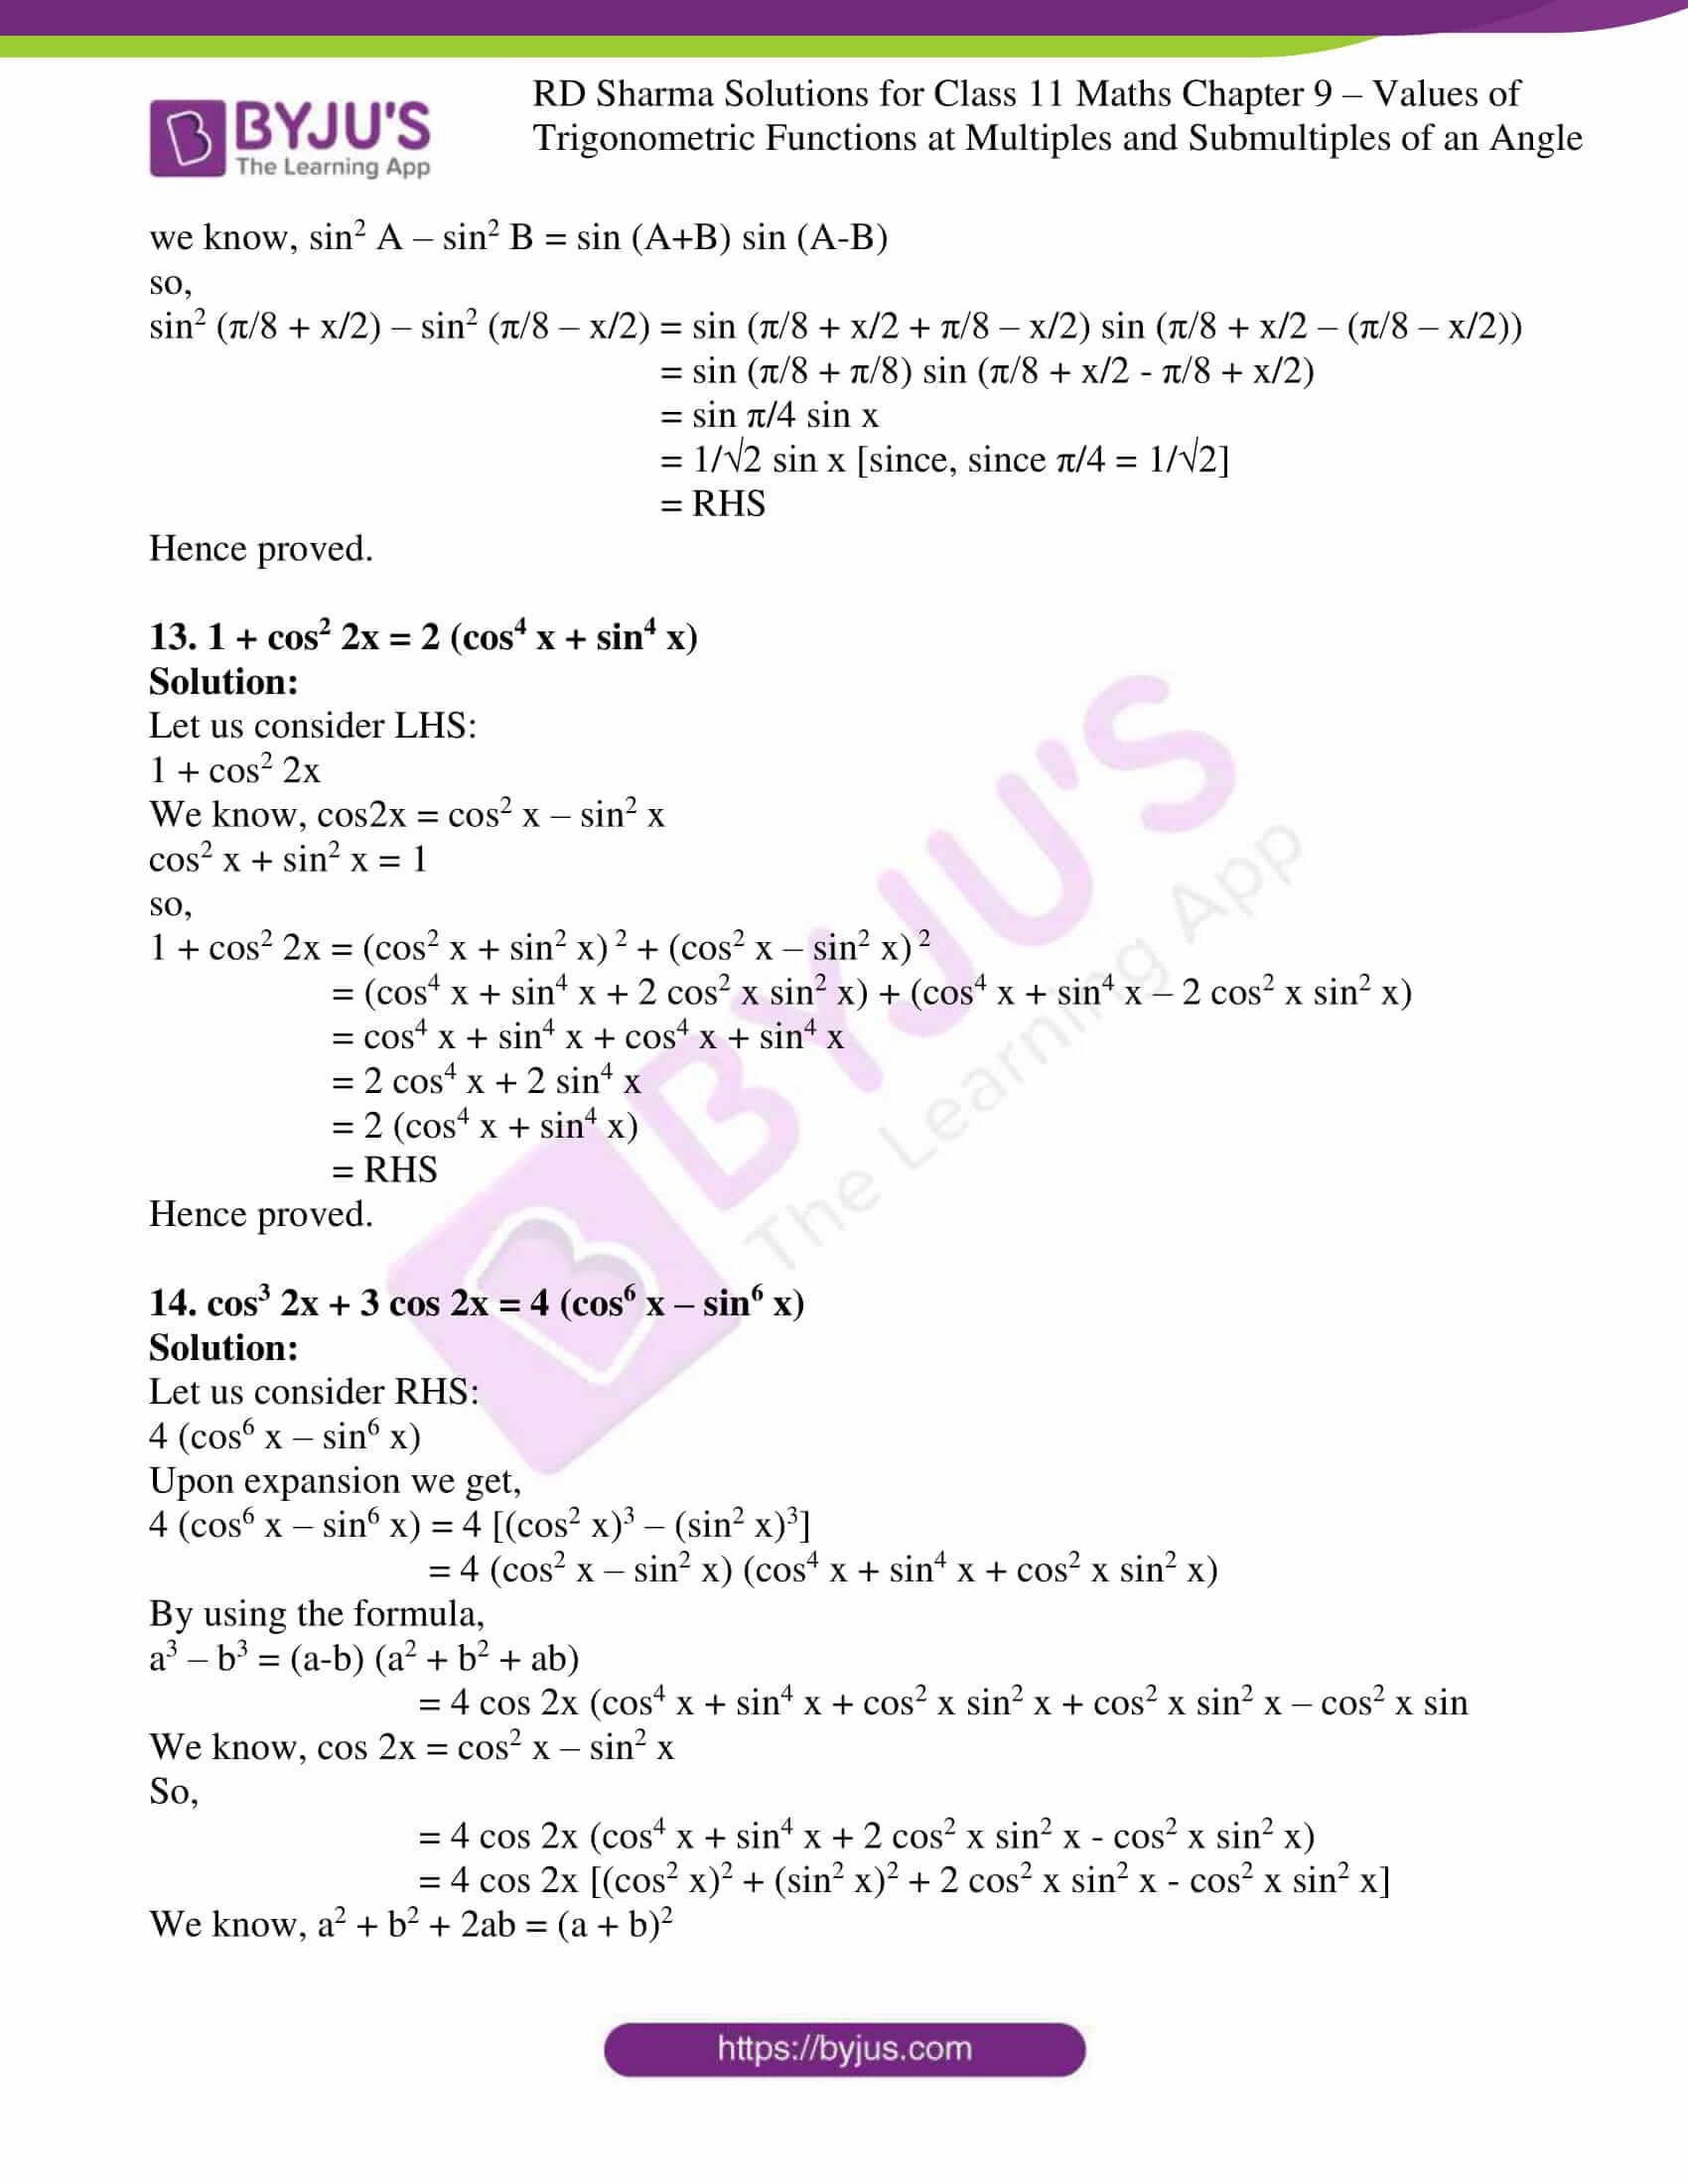 rd sharma class 11 maths ch 9 ex 1 09